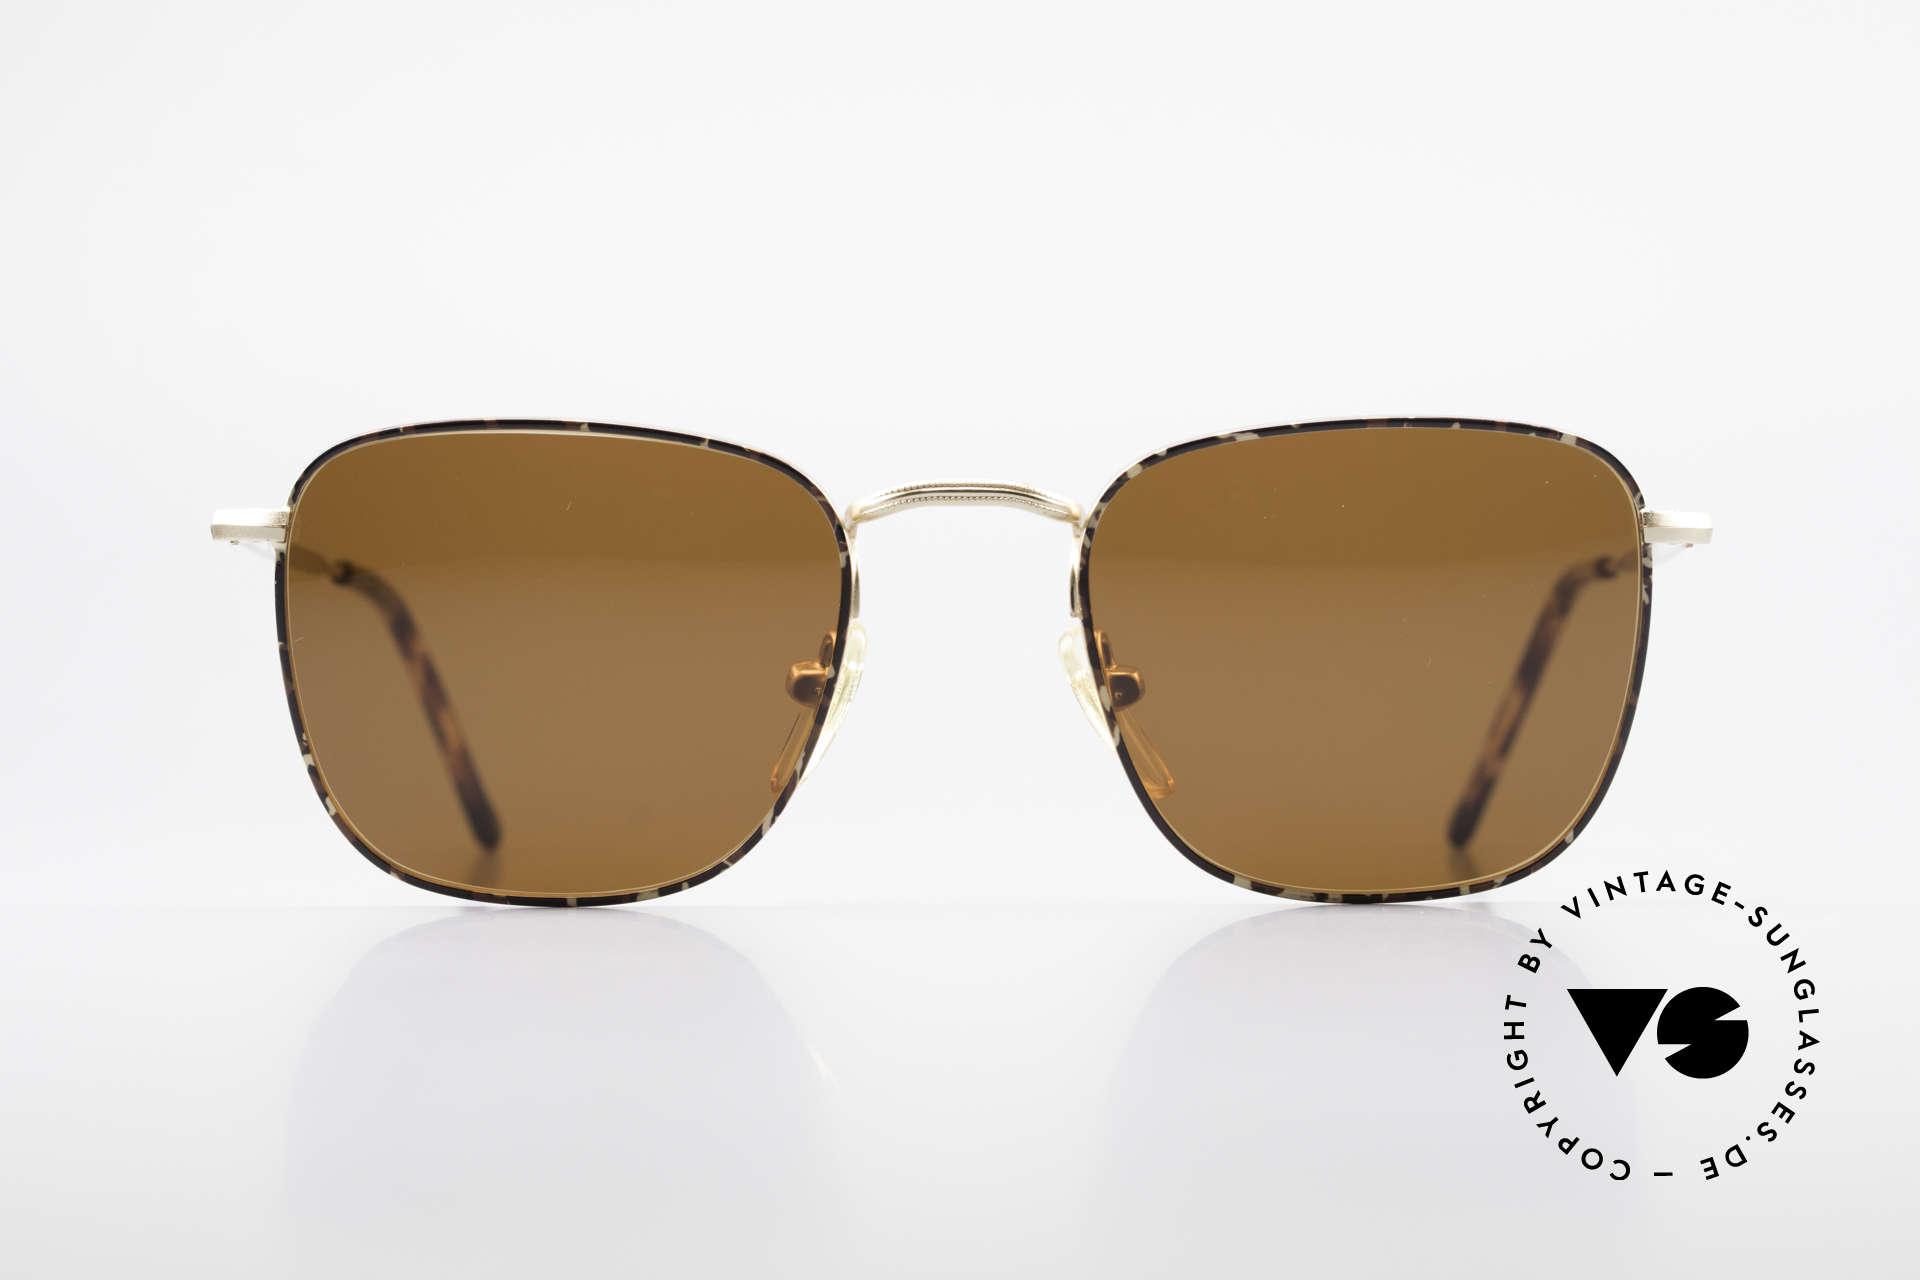 Giorgio Armani 137 Square Panto Vintage Shades, square 'panto' frame design .. a real eyewear classic, Made for Men